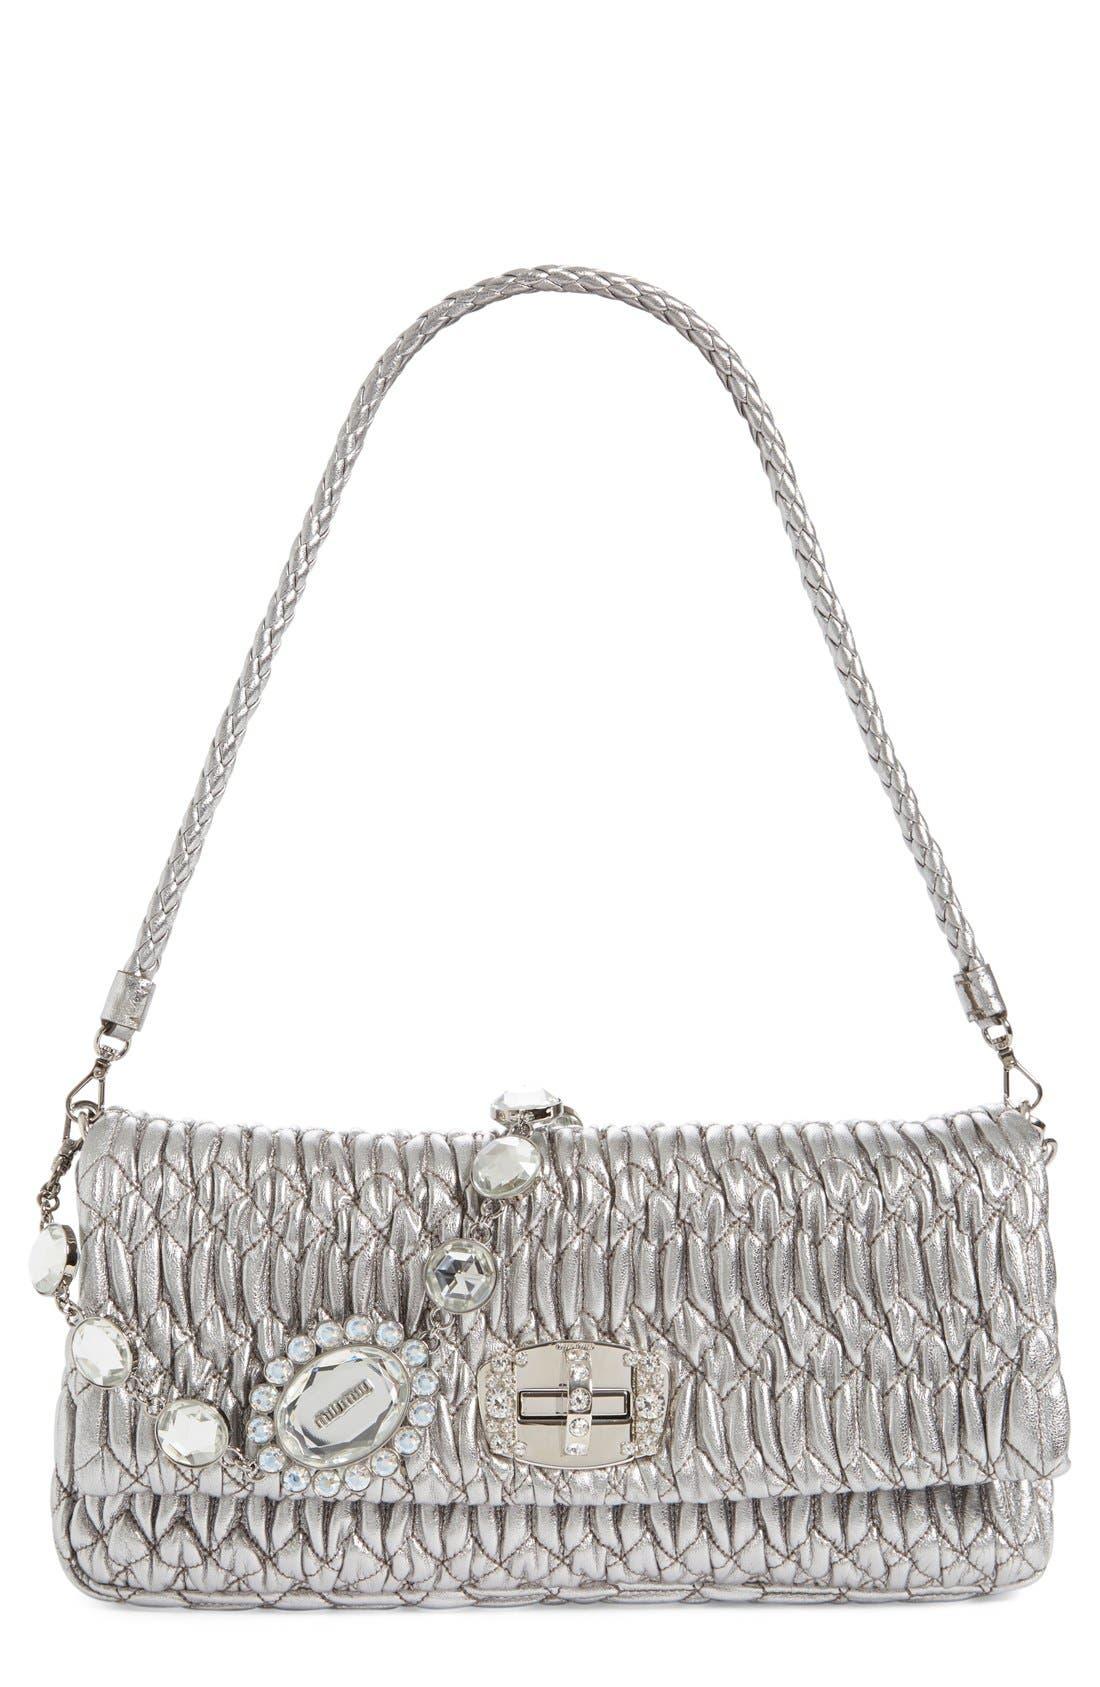 2d42814af91 Miu Miu Medium Swarovski Crystal Chain Leather Shoulder Bag - Metallic In  Cromo